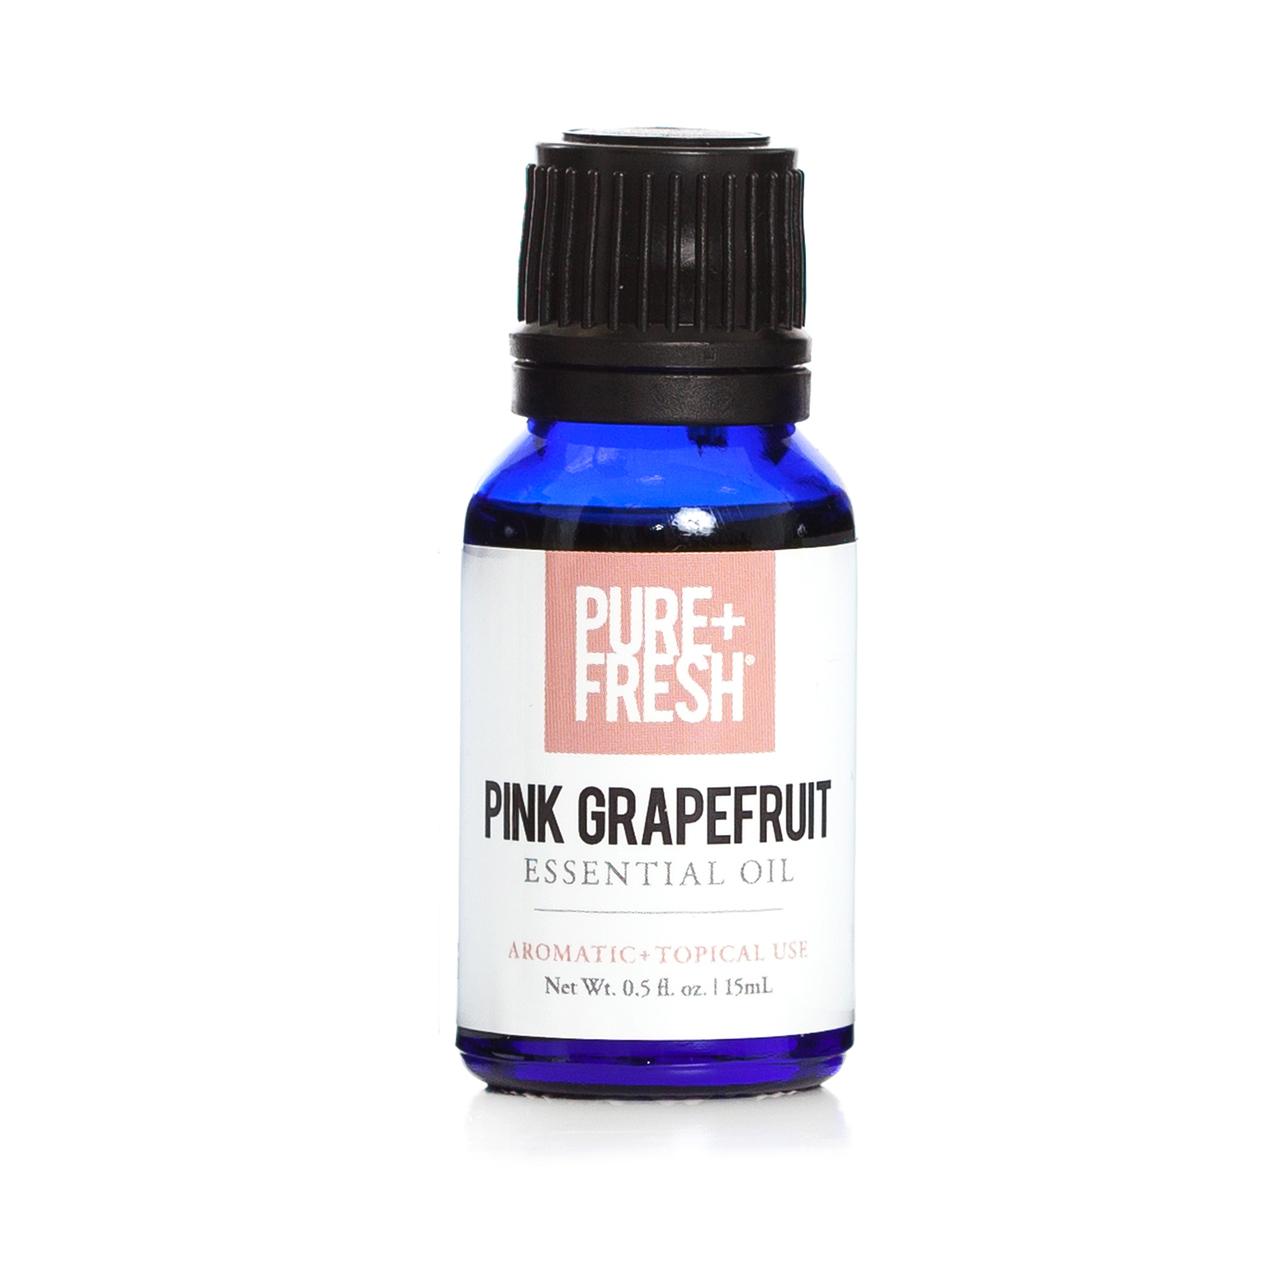 Pure+Fresh Essential Oil - Pink Grapefruit - 15ml